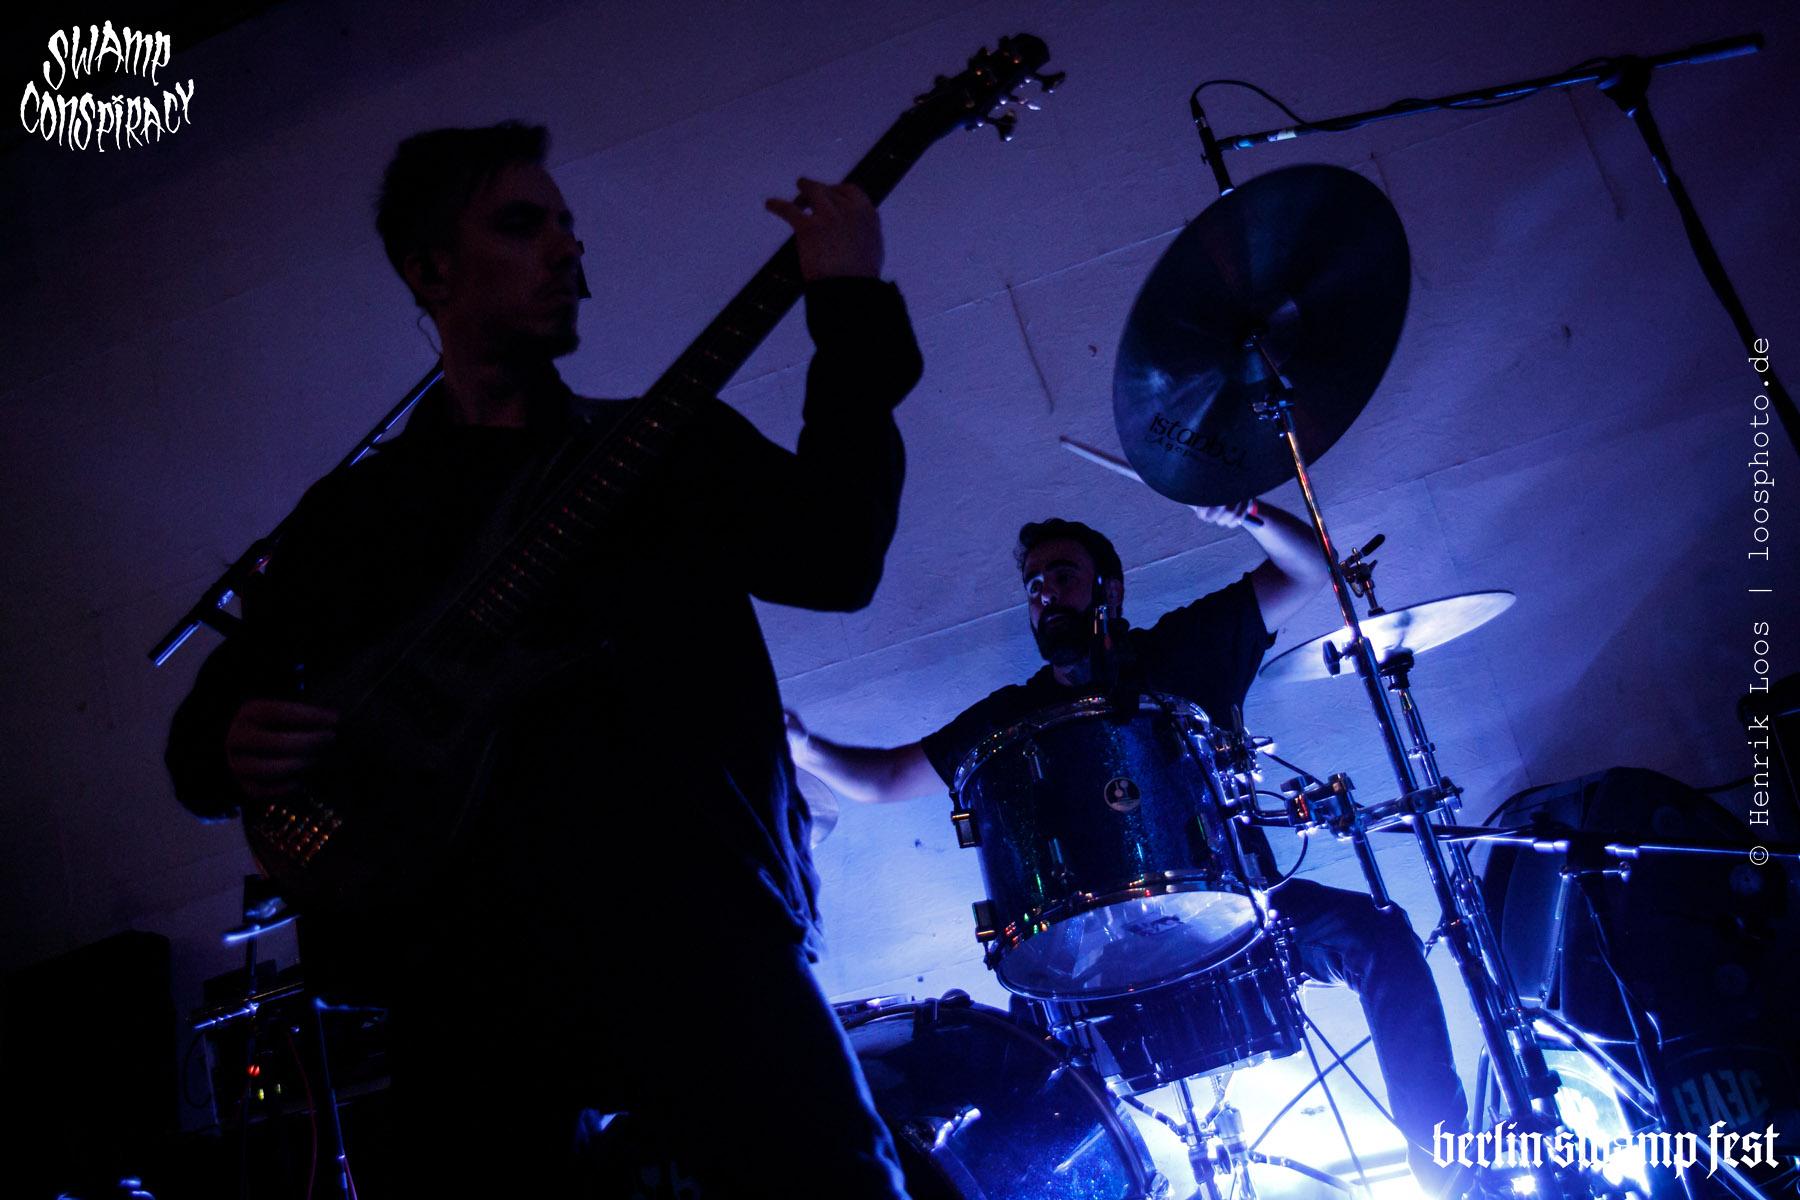 Purpura_Berlin_Swamp_Fest_2019_8